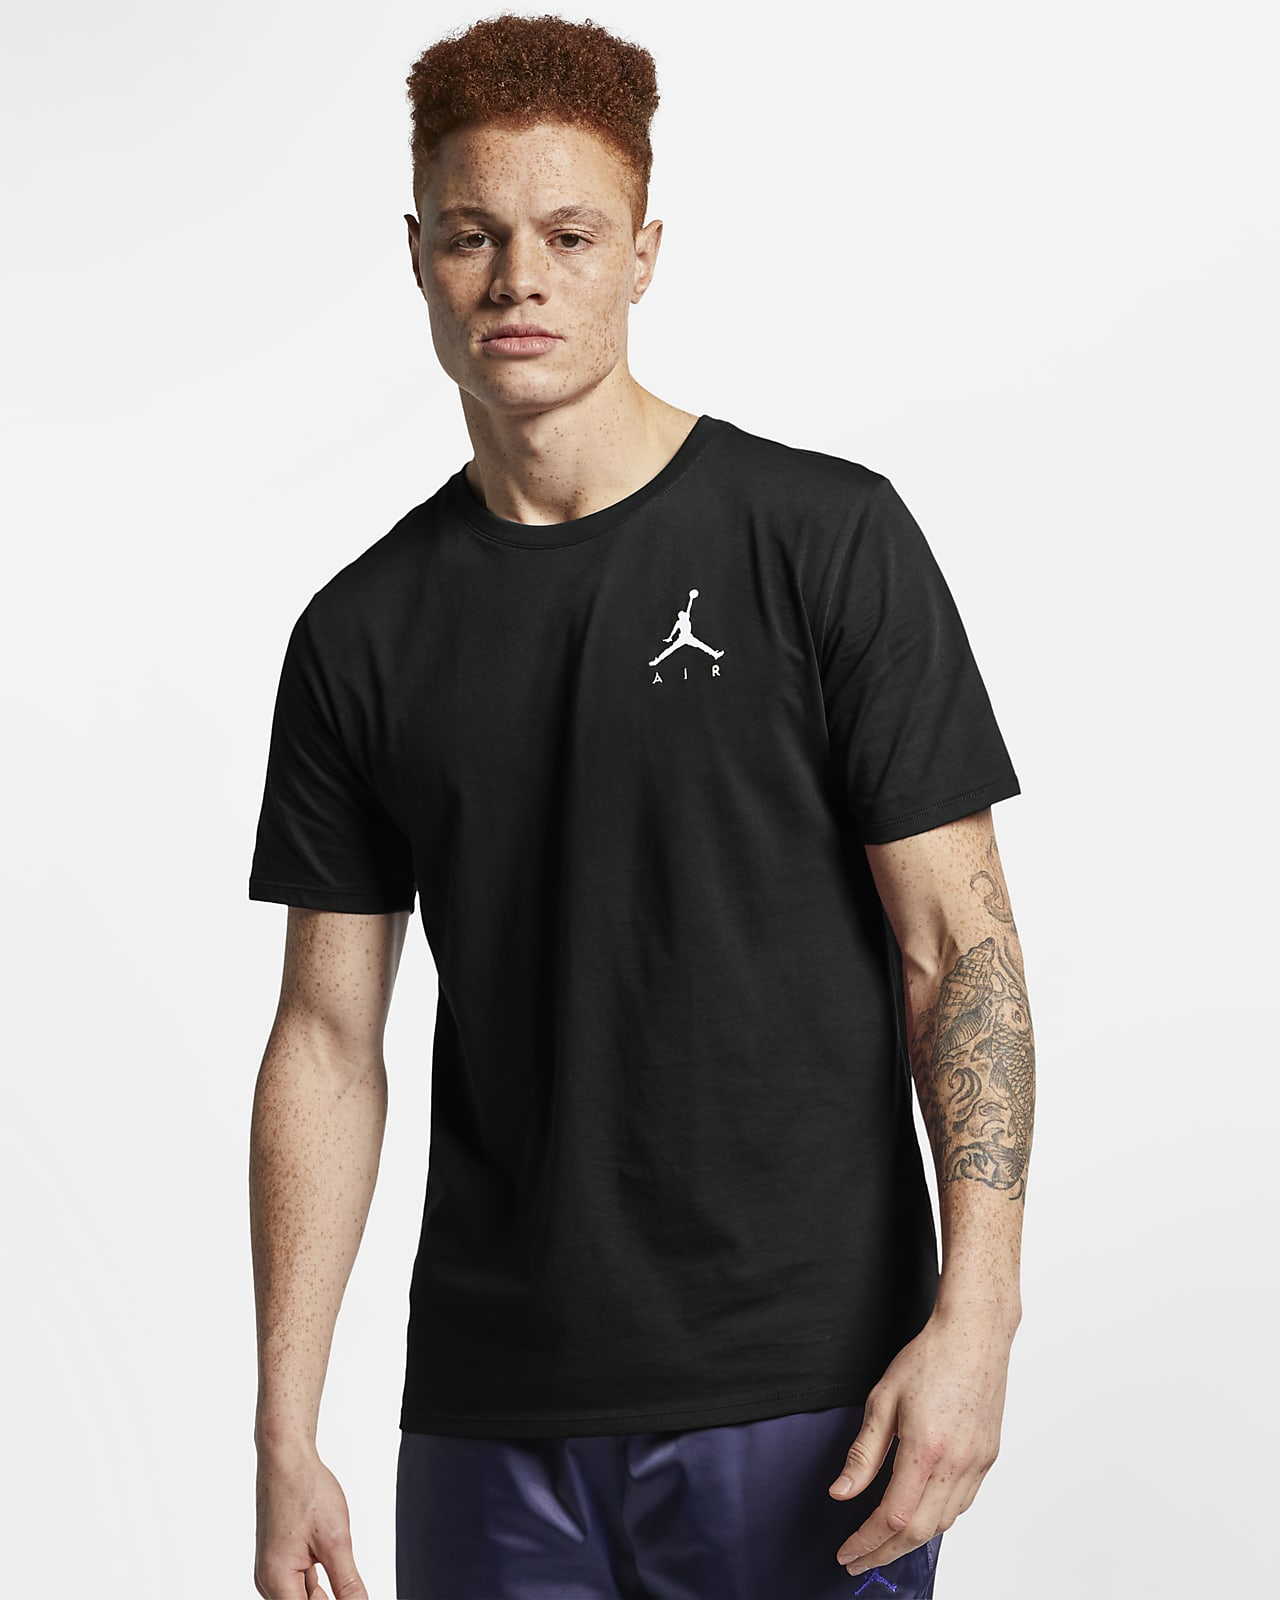 Jordan Jumpman Air T-shirt voor heren